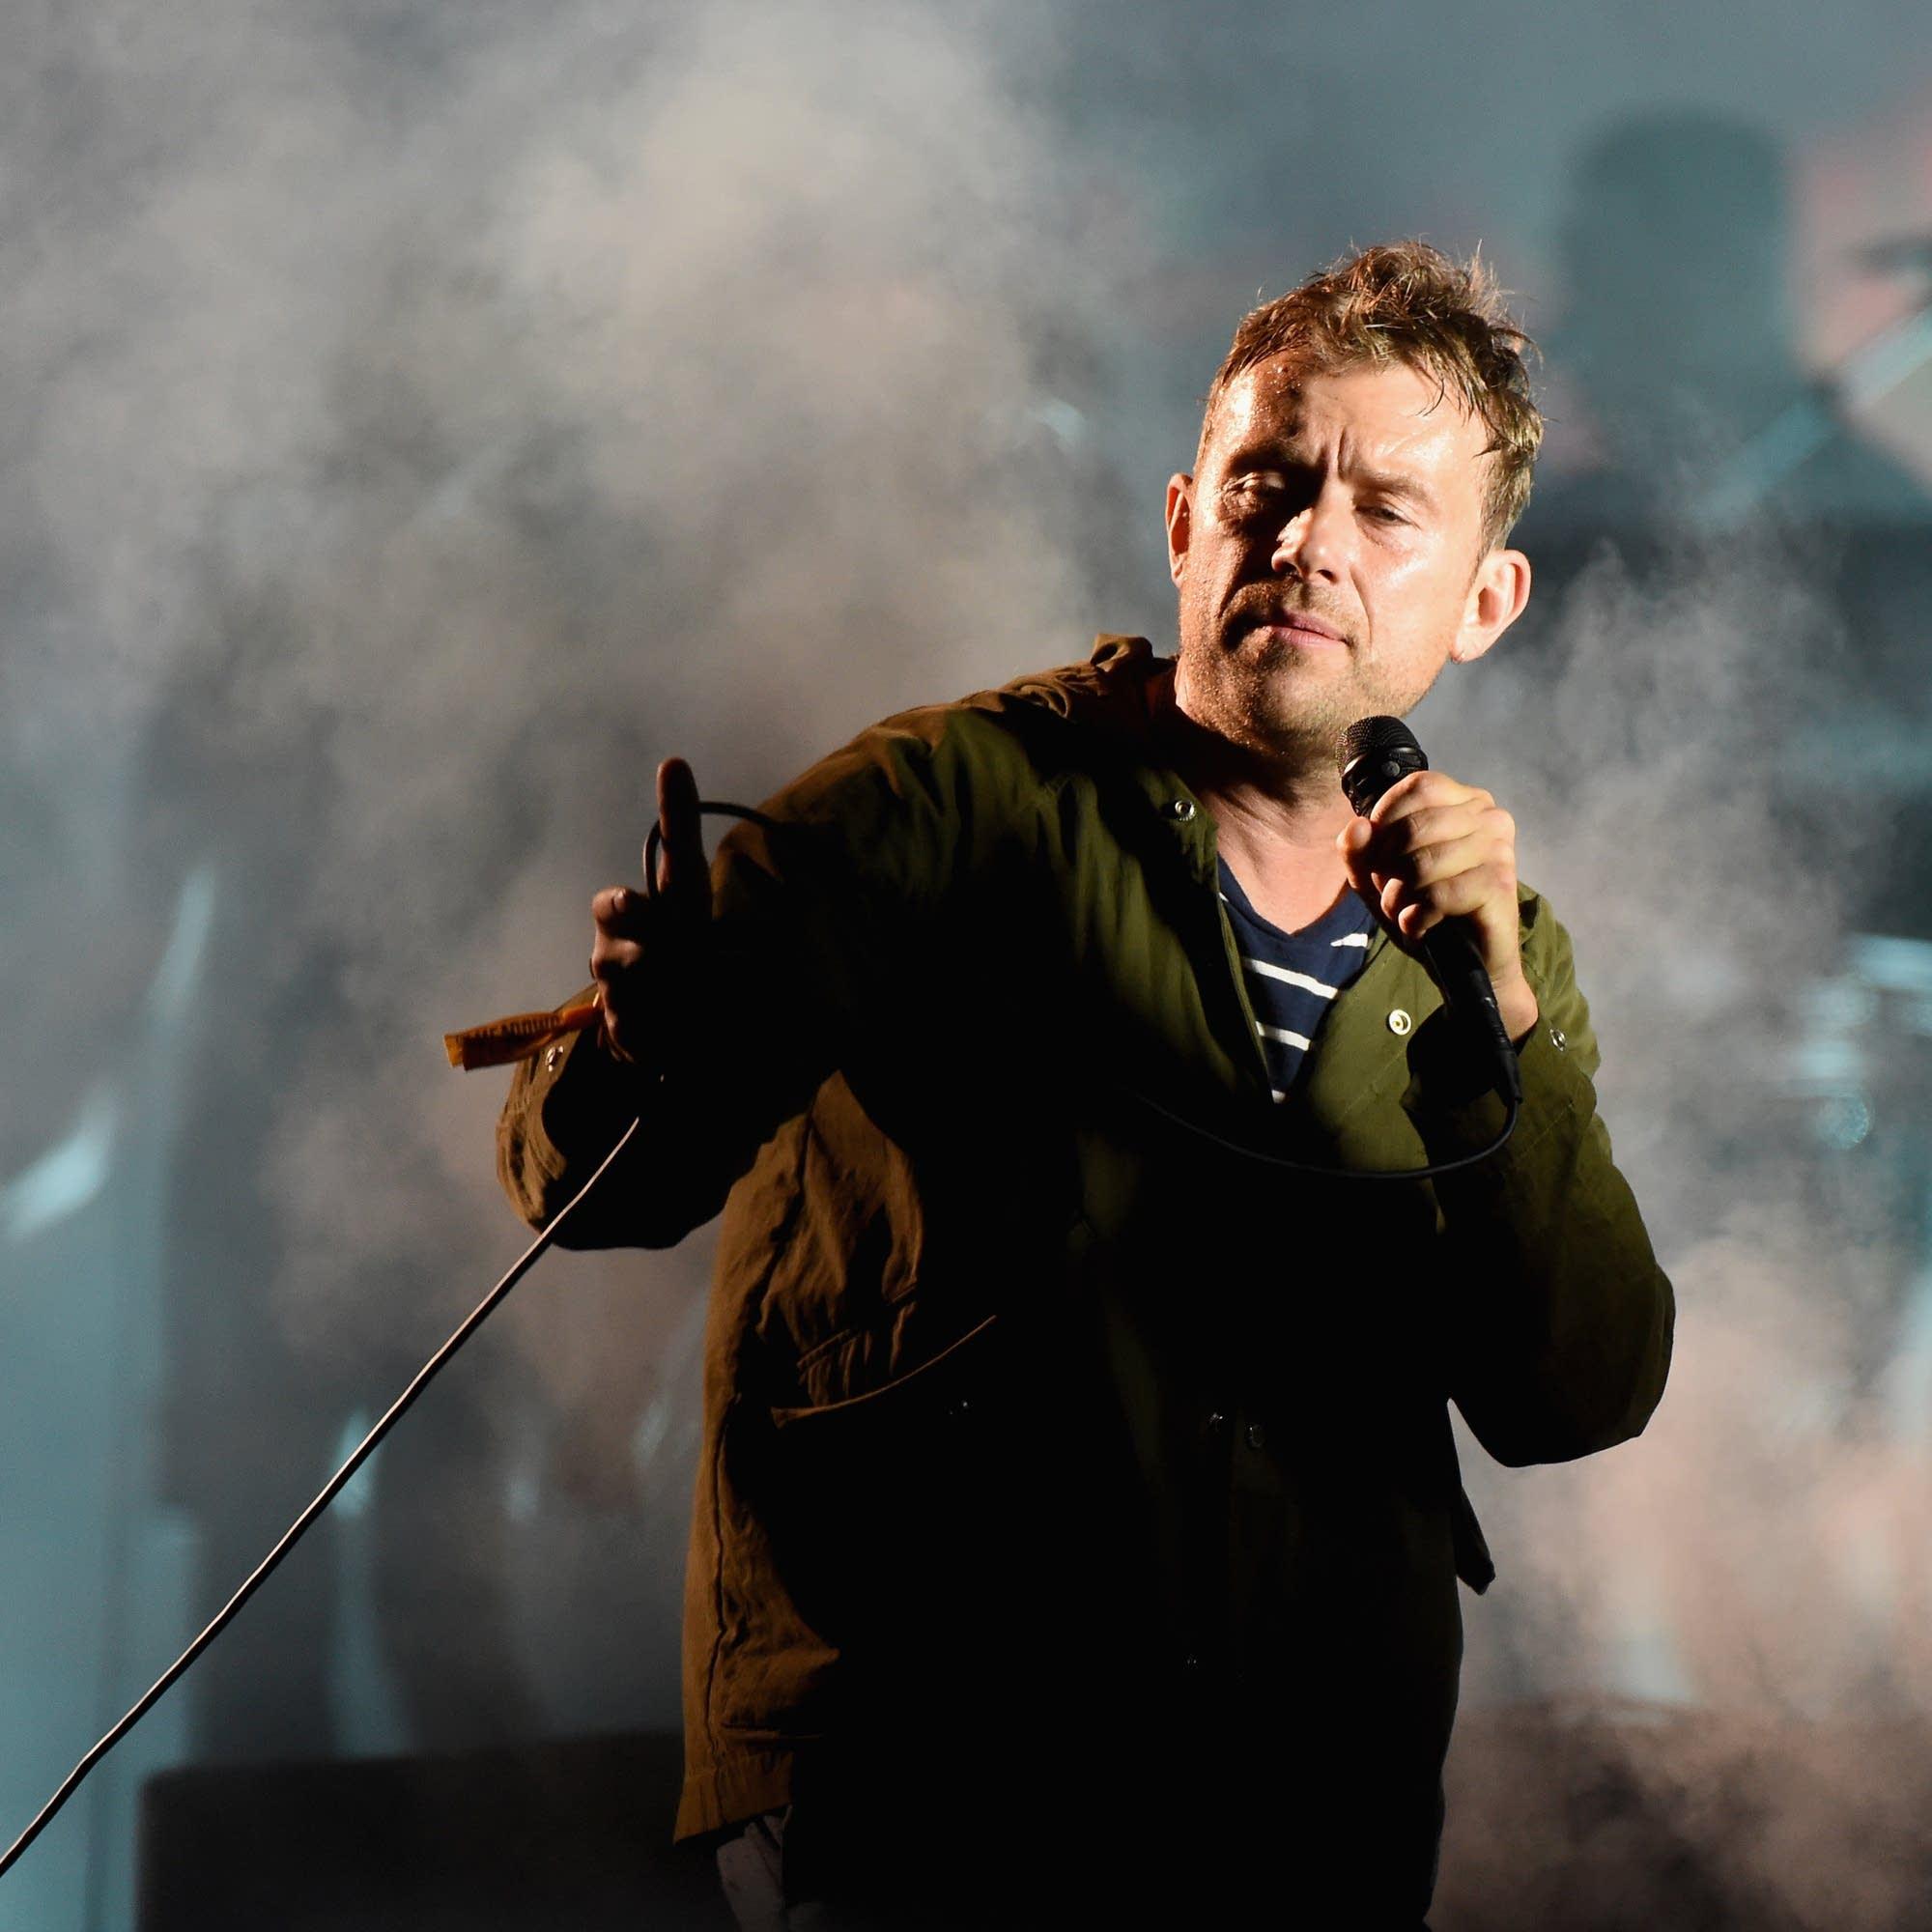 Damon Albarn performs with Gorillaz in 2017.